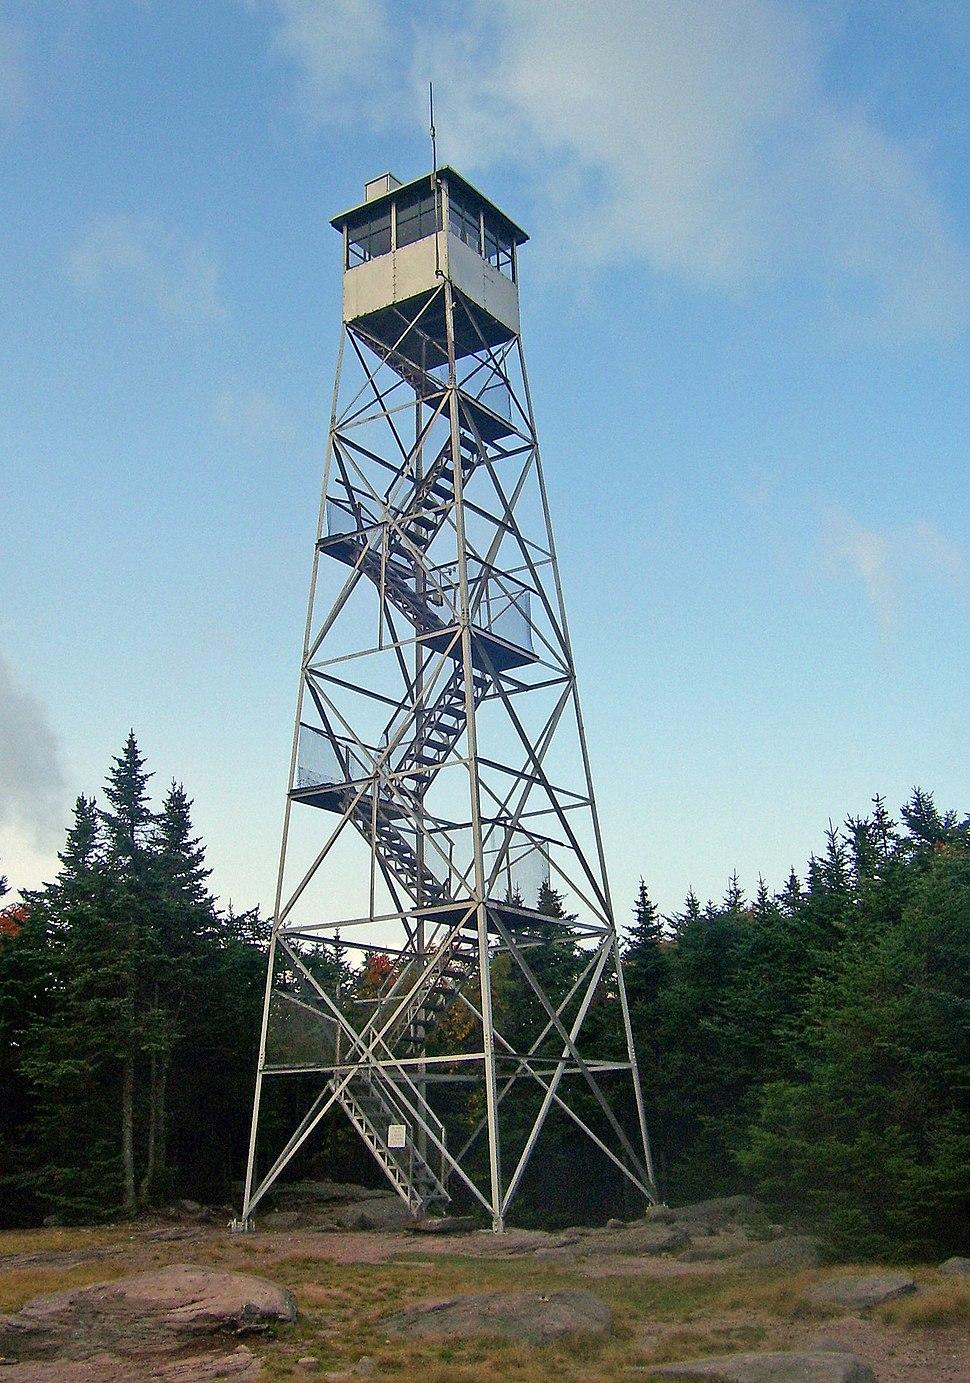 Balsam Lake Mountain fire tower